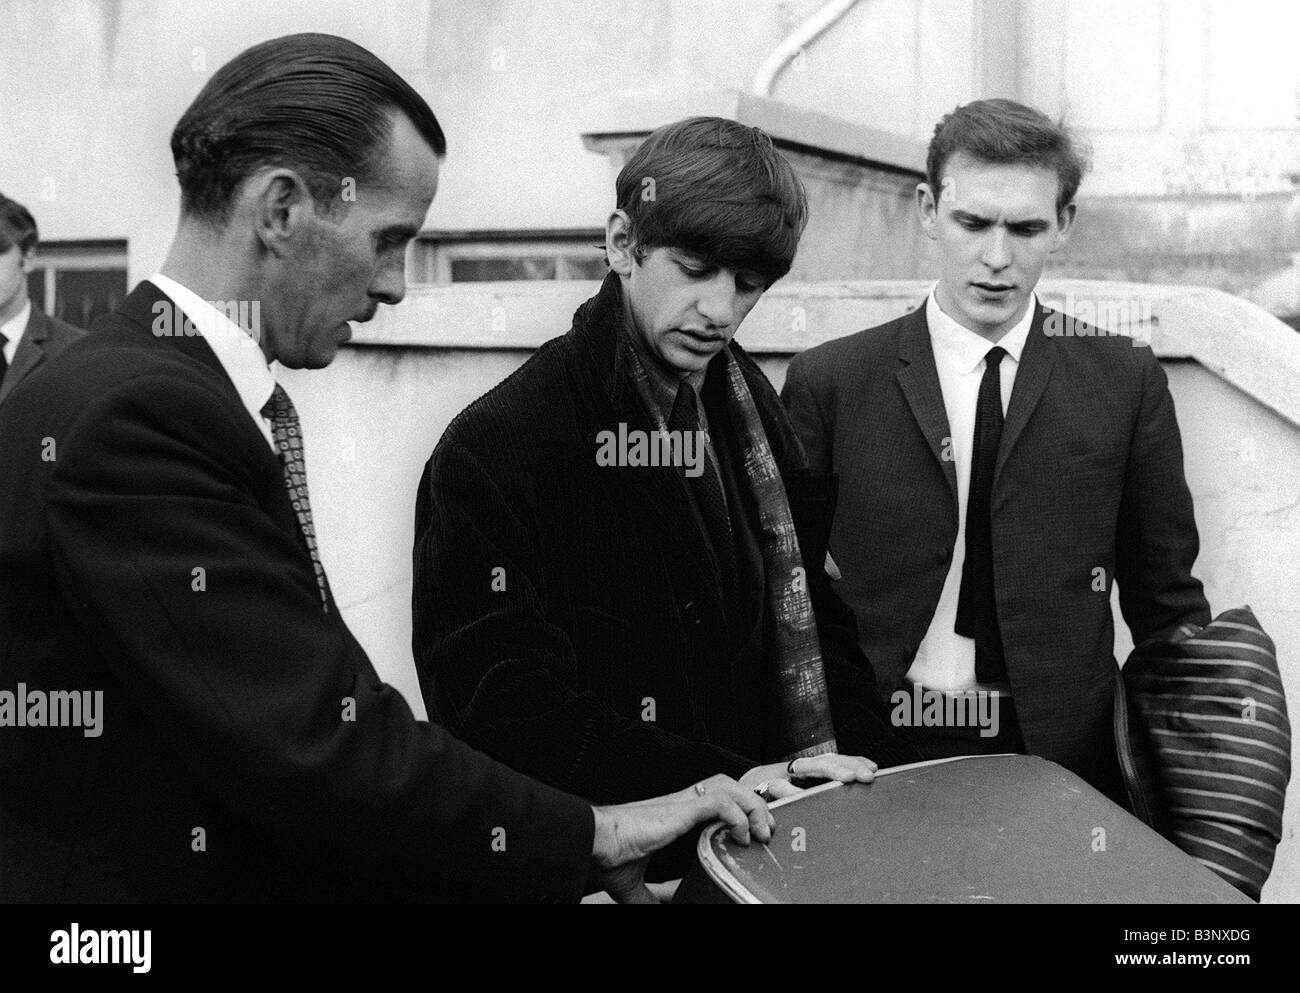 Ringo Starr 1963